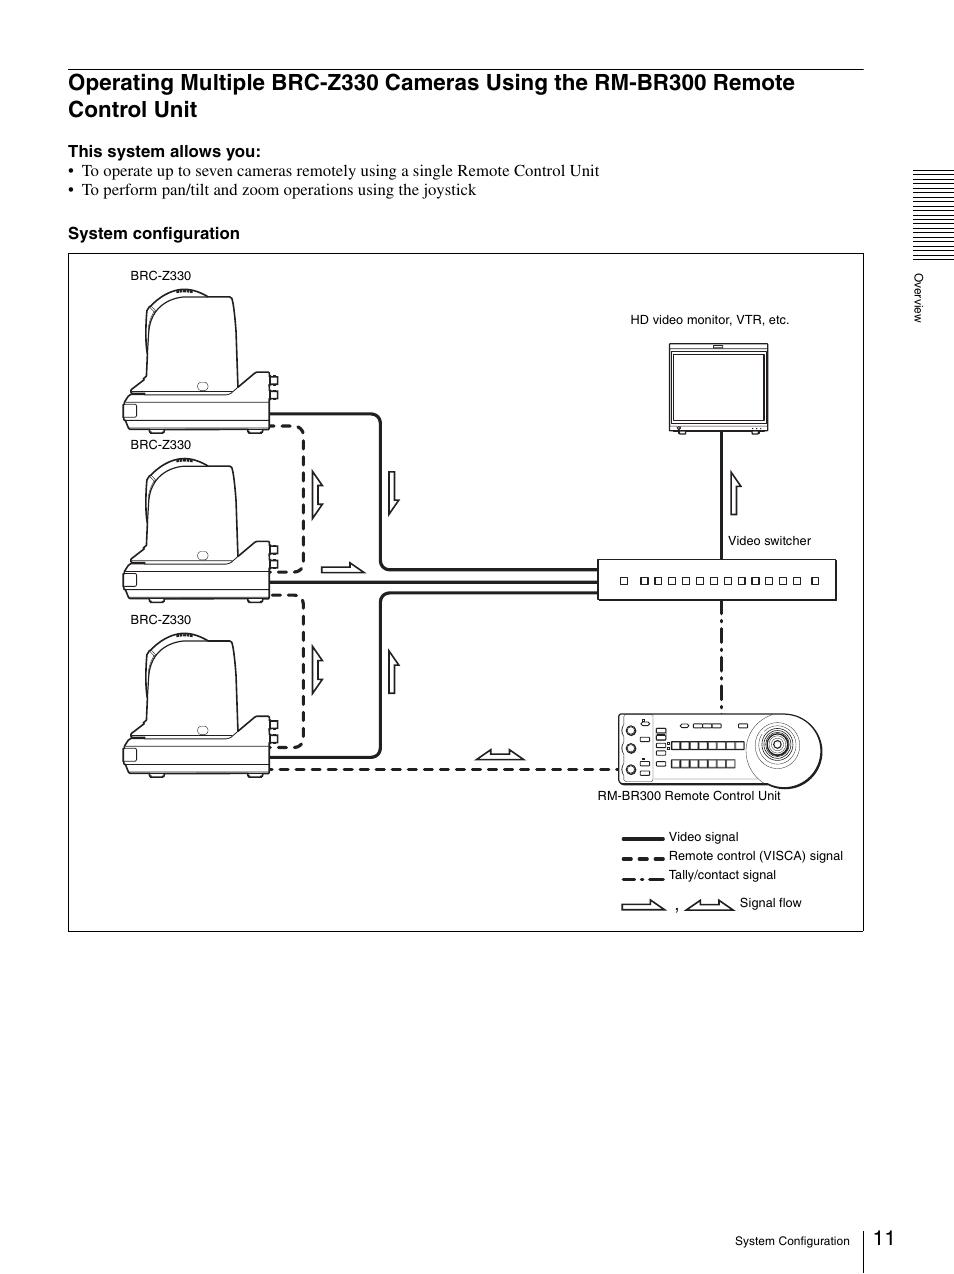 Rm br300 manual ebook.